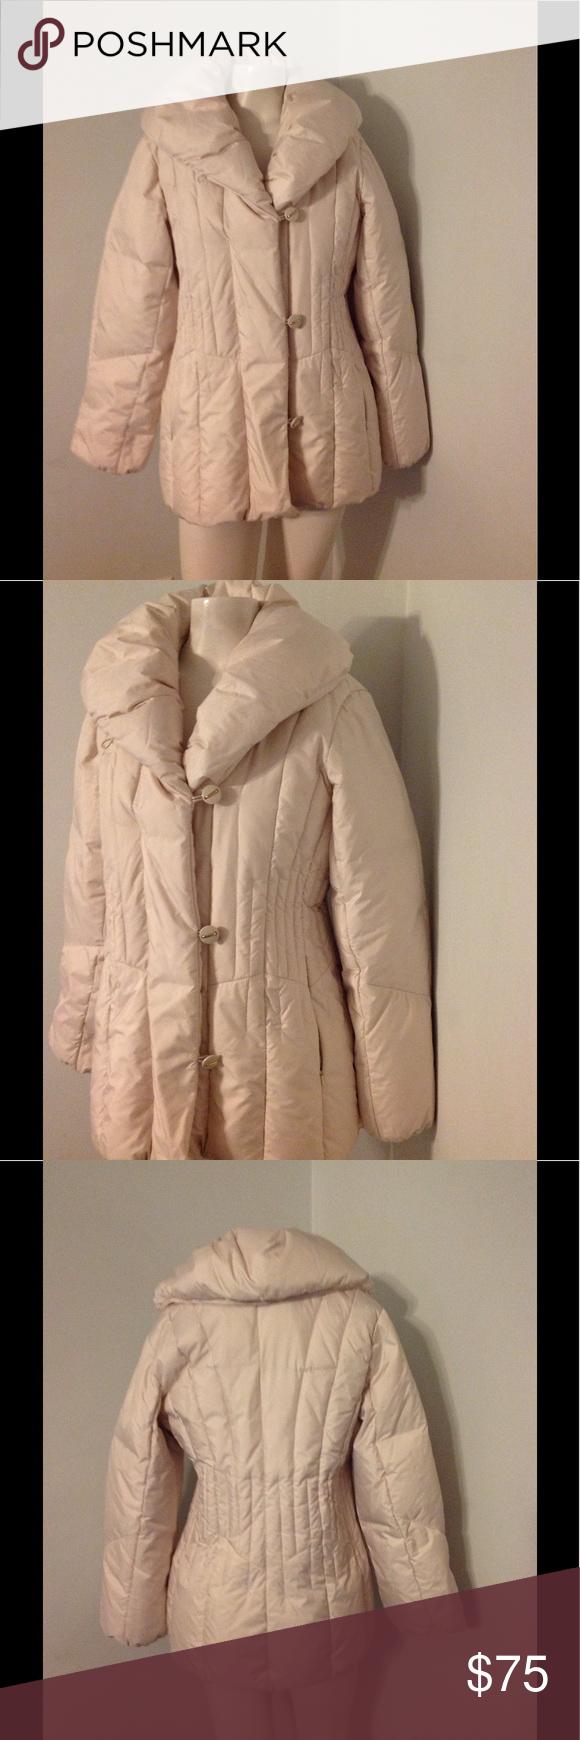 Centigrade Puffer Down Jacket Coat Make An Offer Coat Down Jacket Jackets [ 1740 x 580 Pixel ]